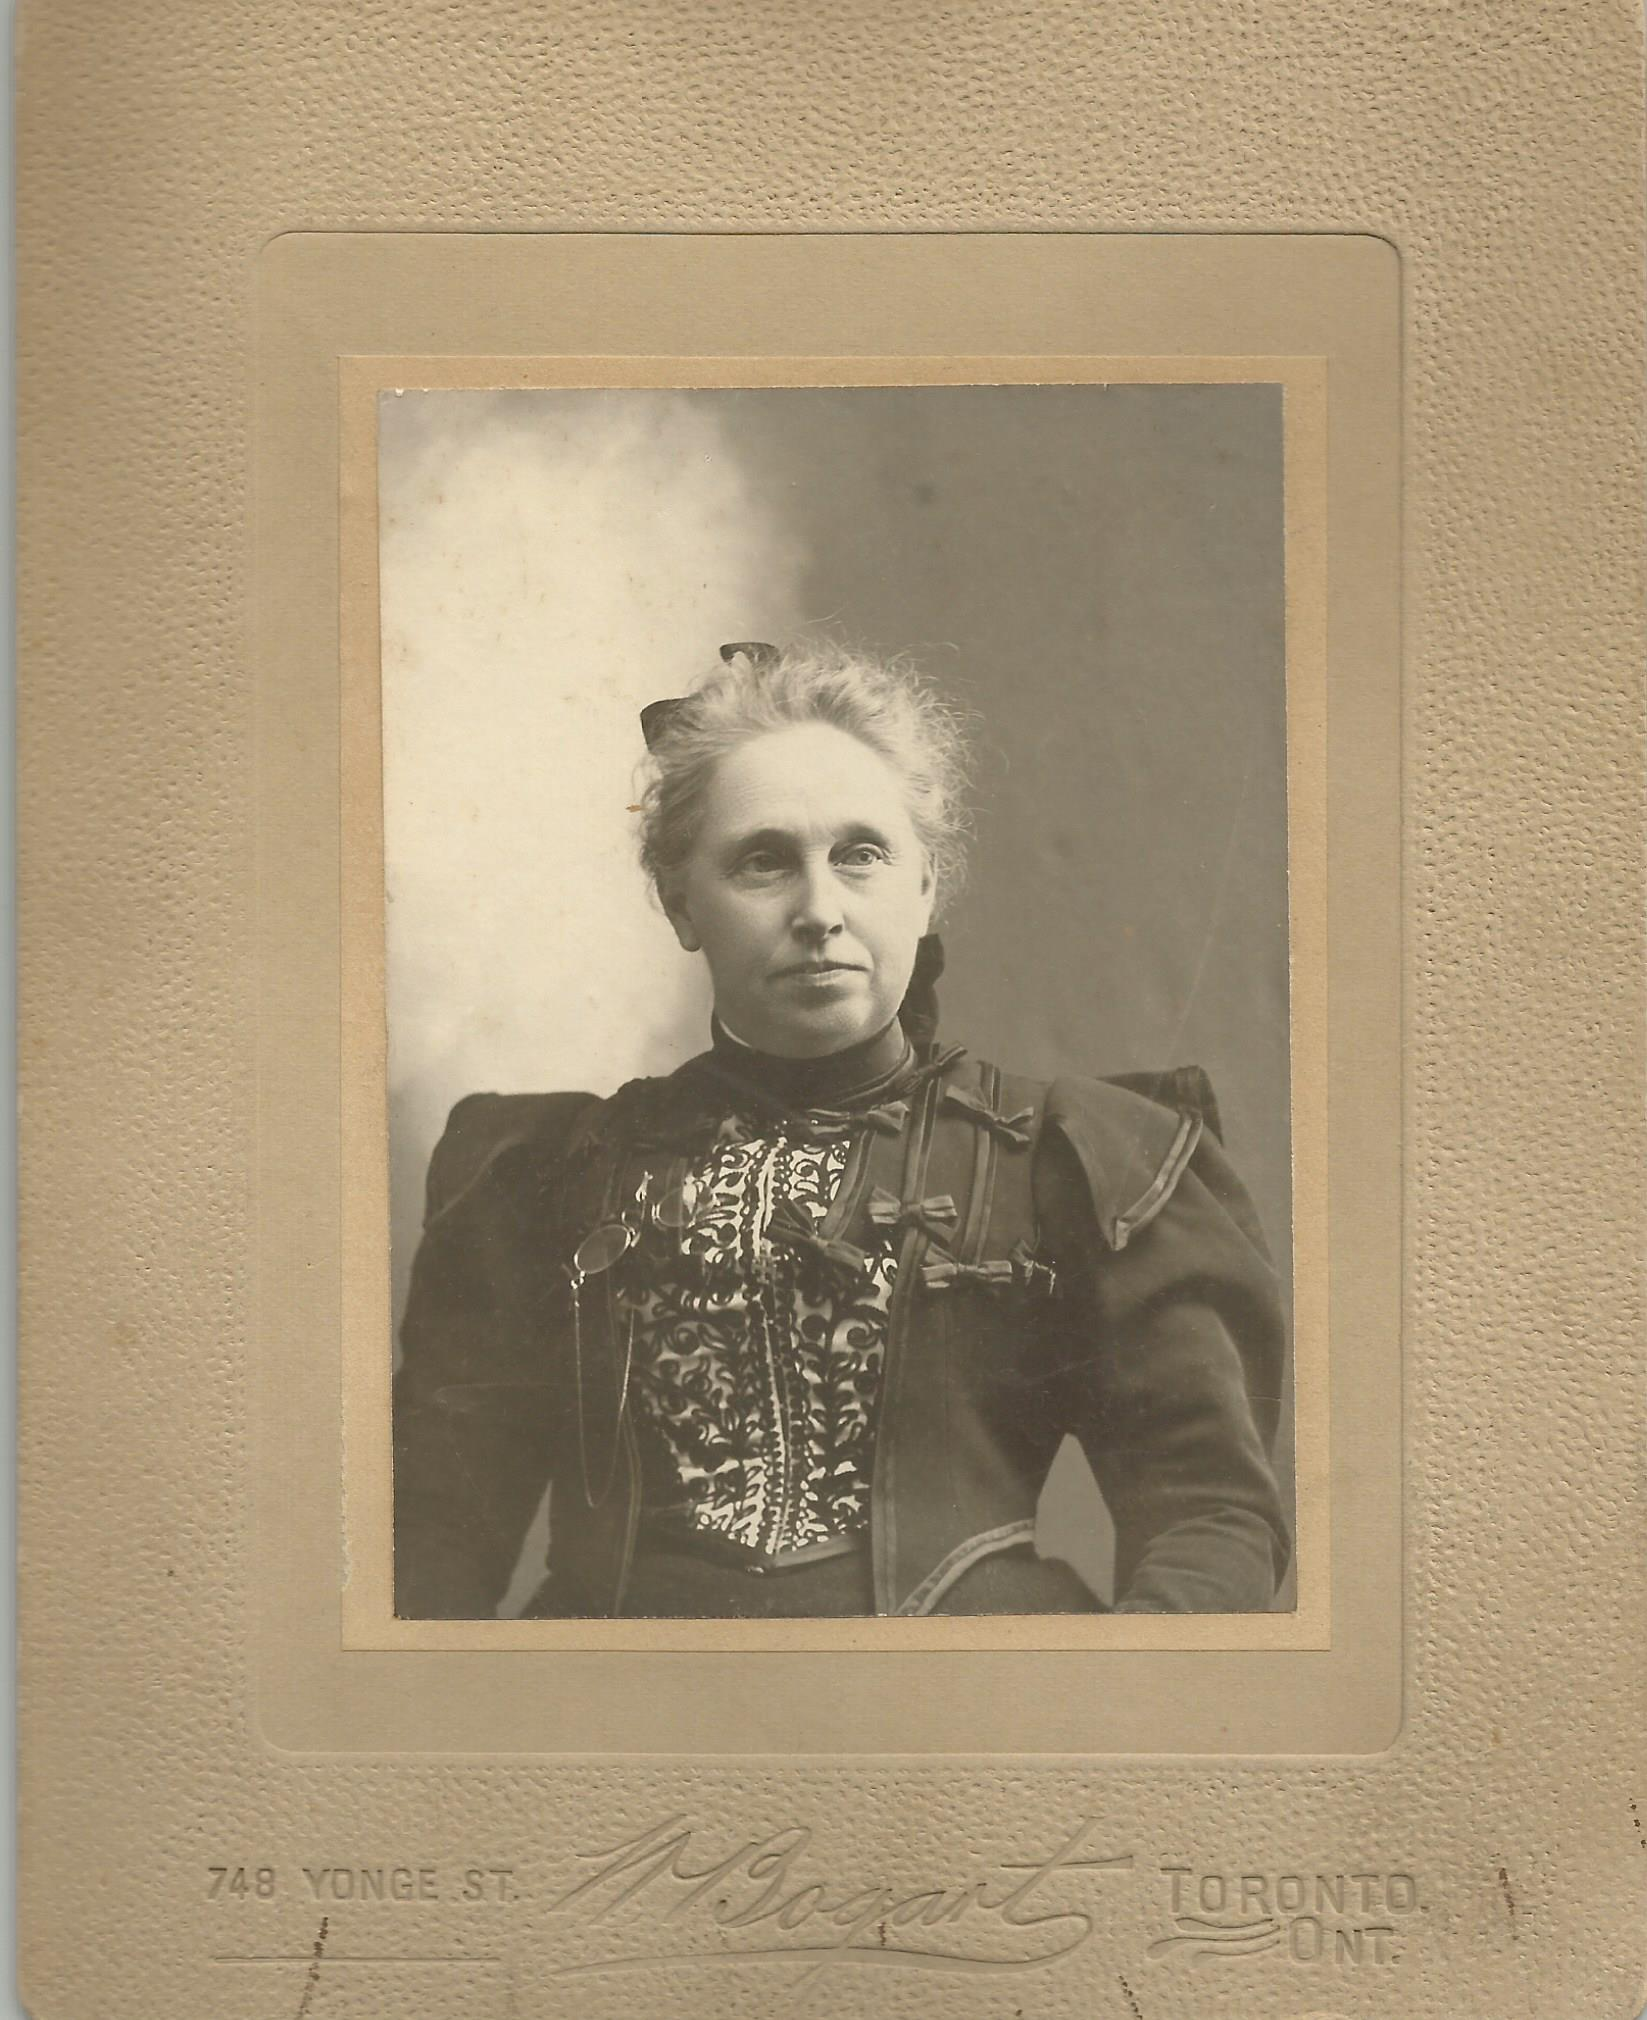 1898Margaret Campion Pearce